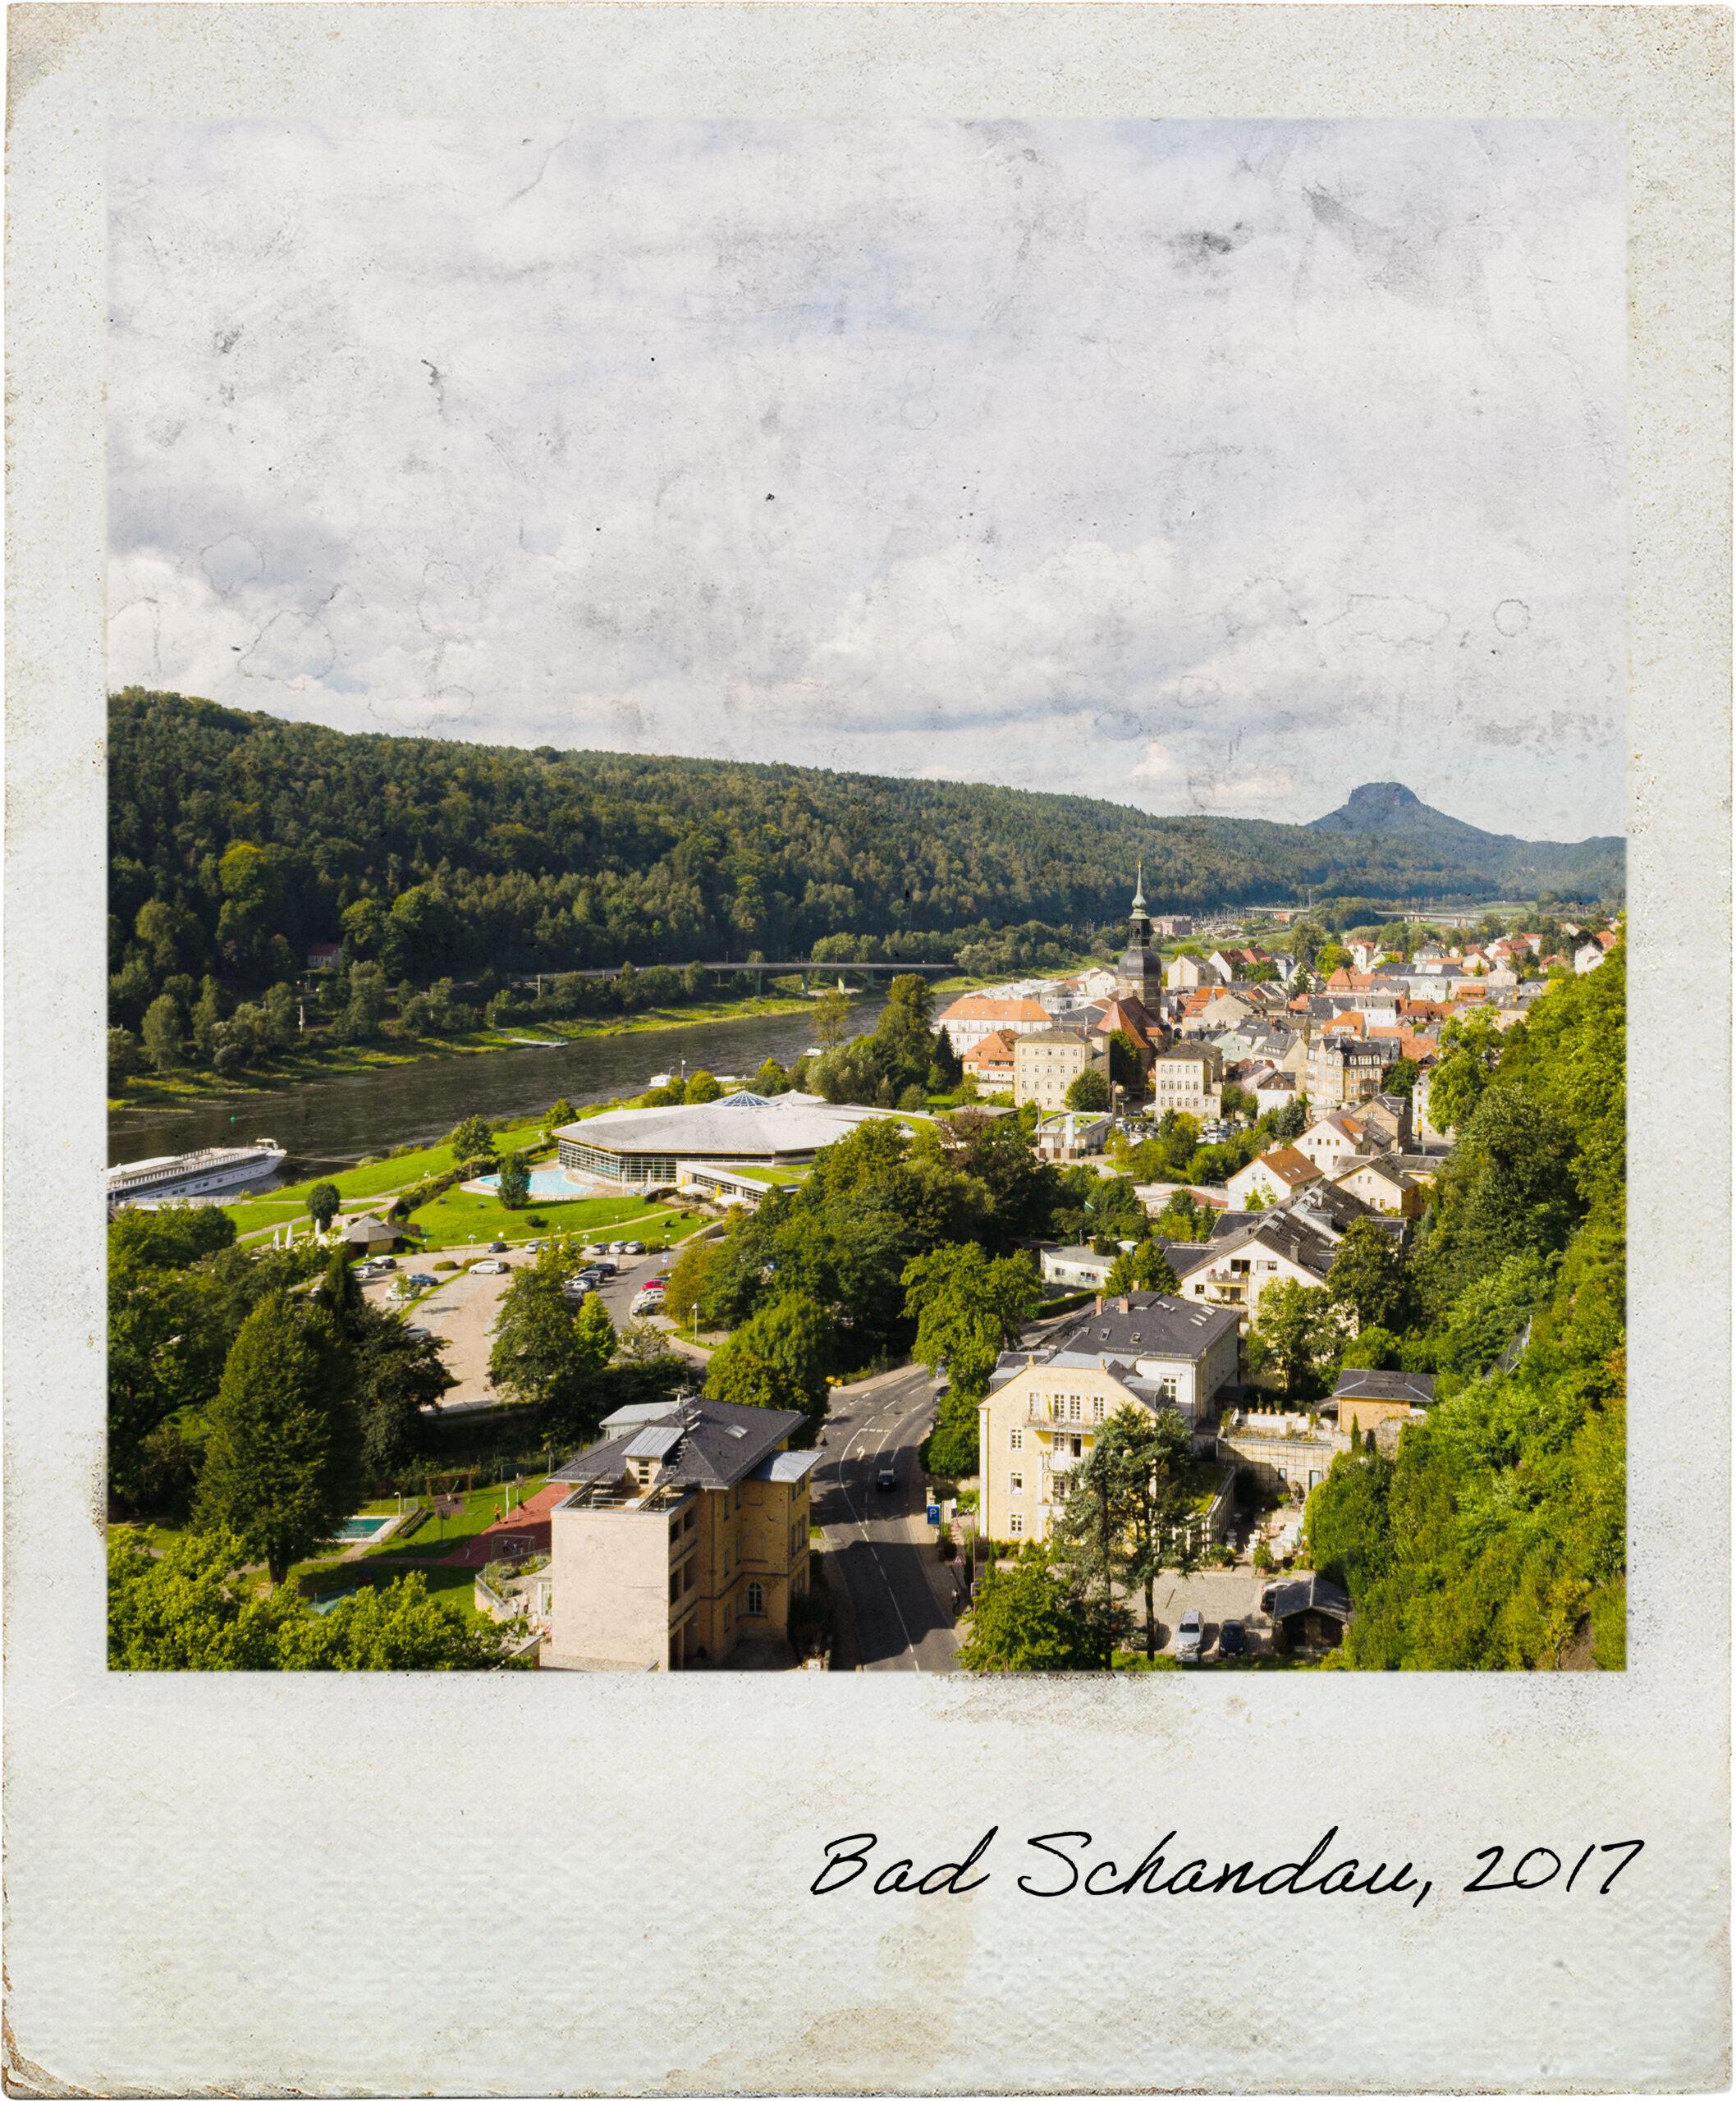 Bad Schandau e o Vale do Elba